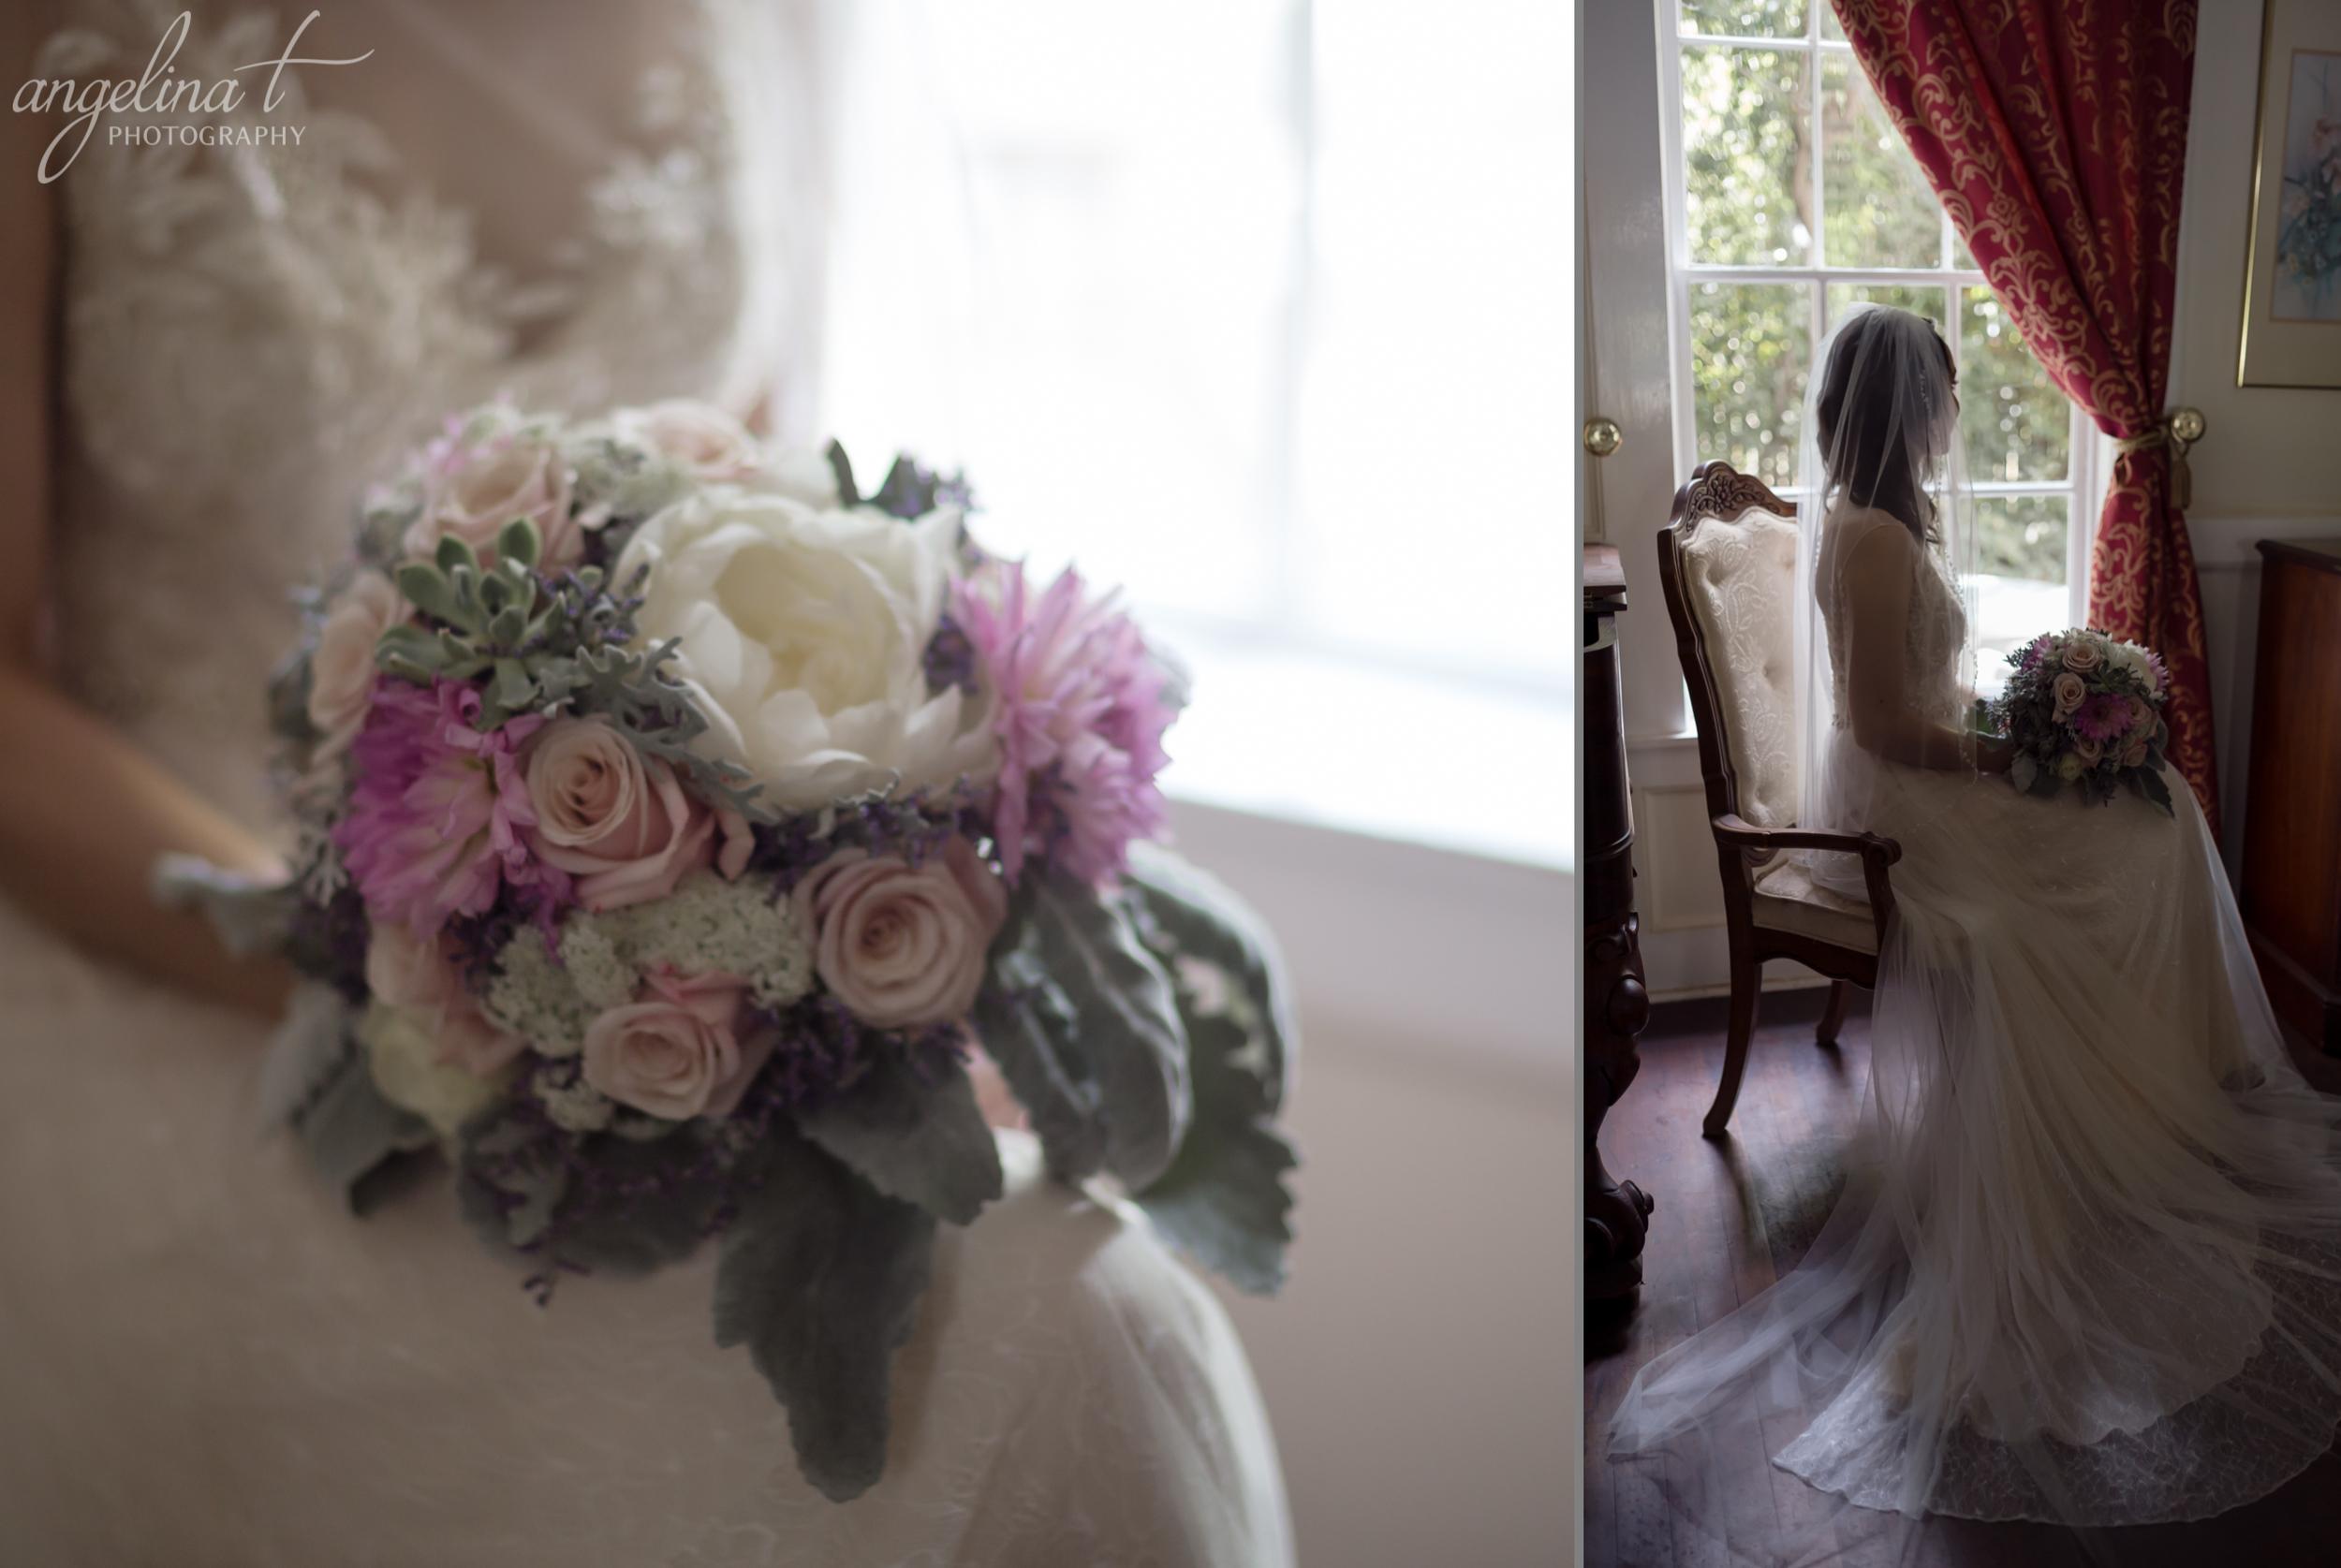 Heirloom-Inn-Garden-Wedding-Photography-Ione-89.jpg